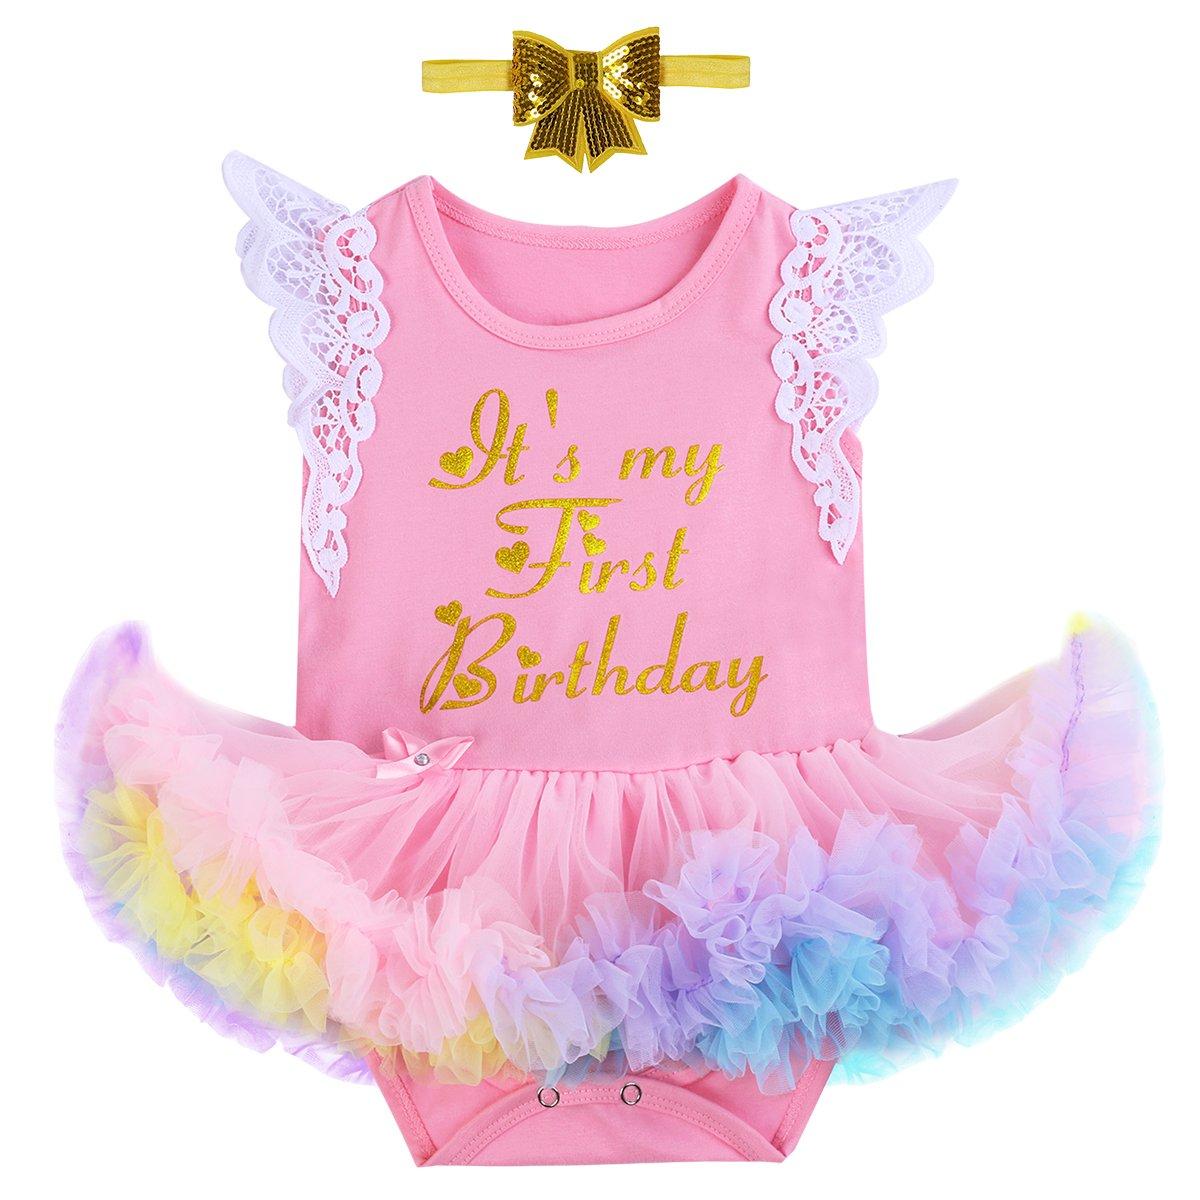 abdae23a05a2 Amazon.com  Baby Kids Newborn It s My 1st Birthday Cake Smash Outfits  Romper+Shoes+Headband for Girl Tutu Princess Dress Set  Clothing